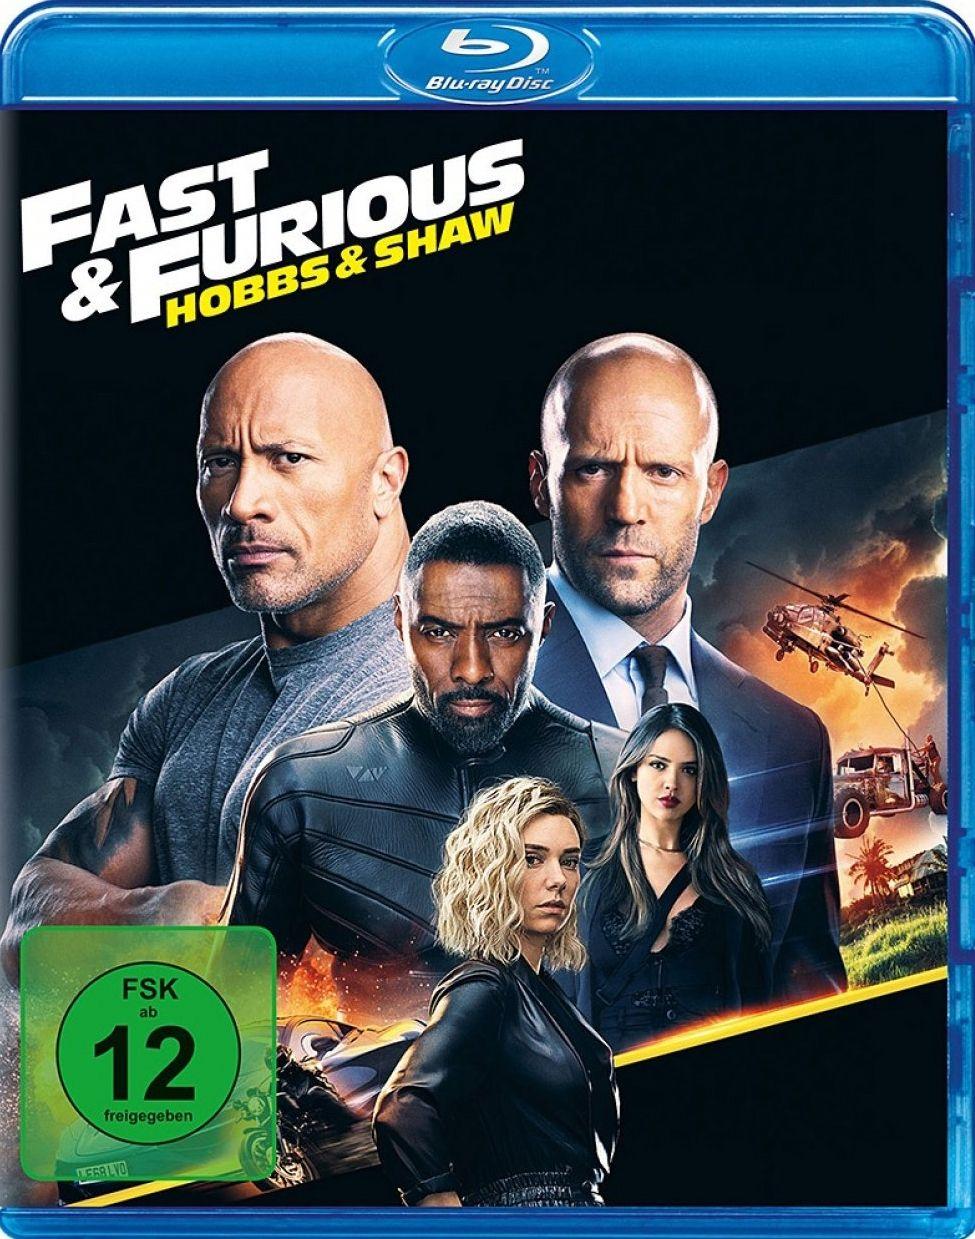 Fast & Furious - Hobbs & Shaw (BLURAY)